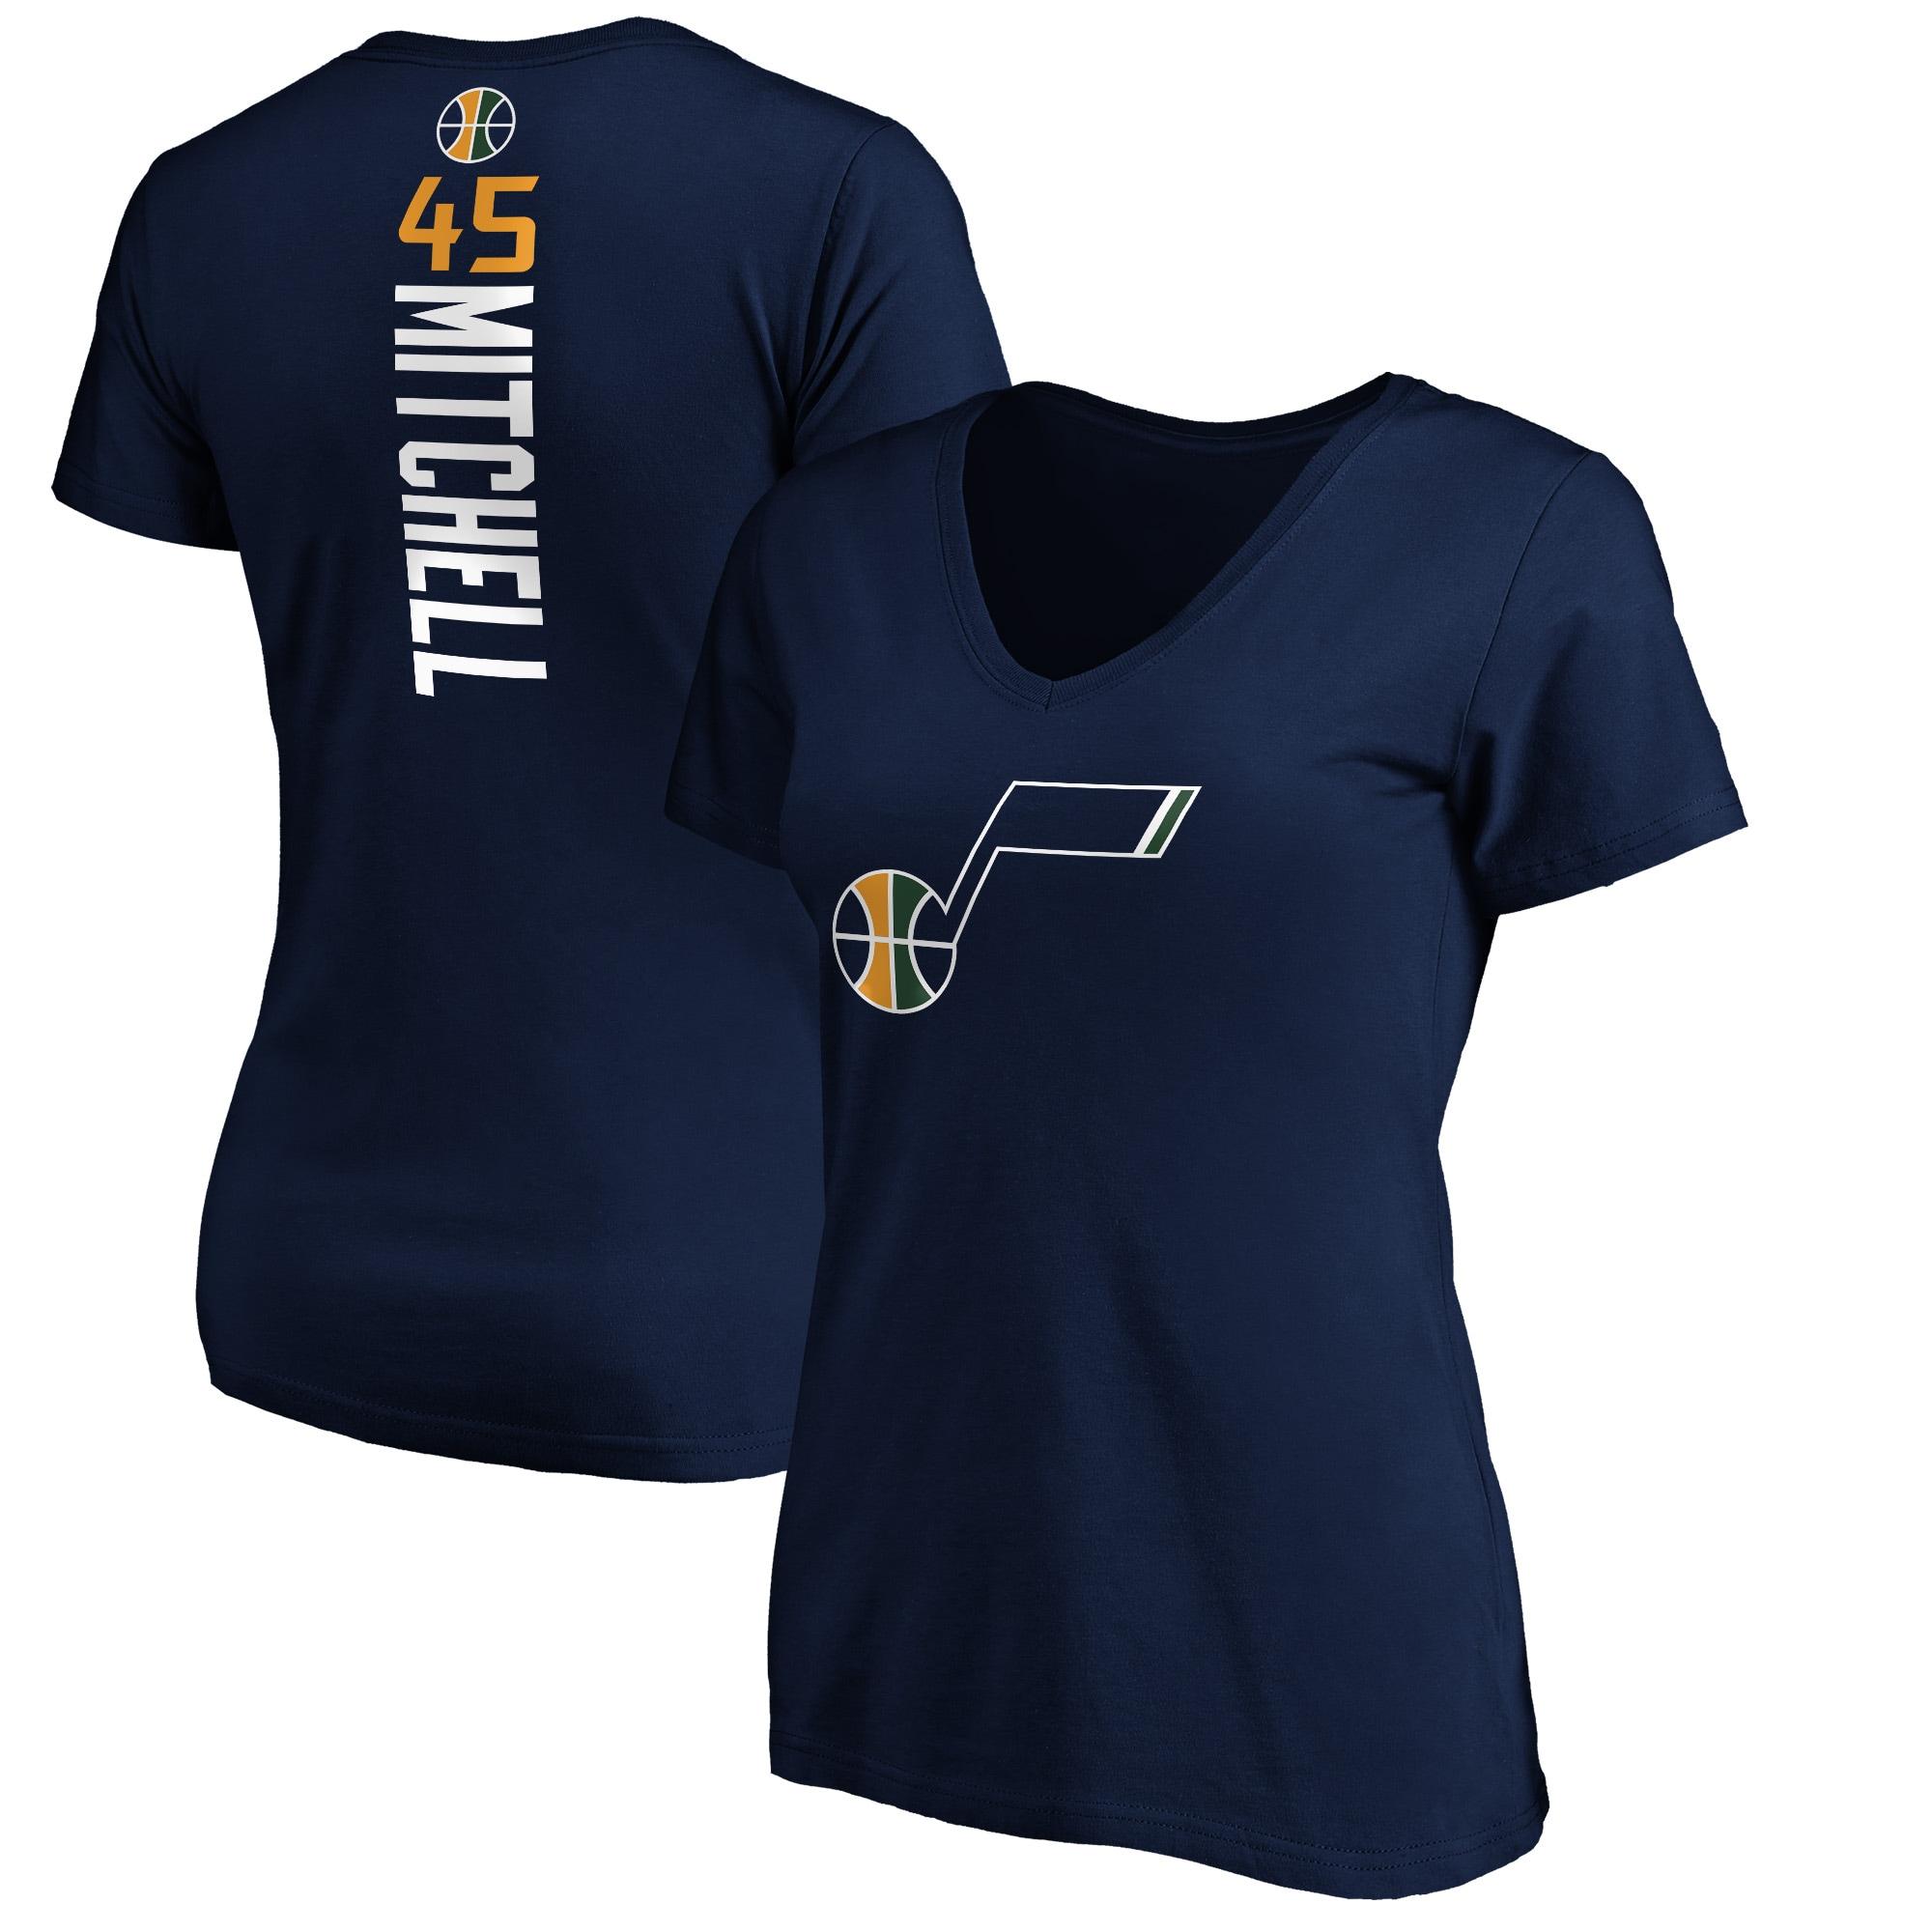 Donovan Mitchell Utah Jazz Fanatics Branded Women's Plus Size Playmaker Name & Number V-Neck T-Shirt - Navy